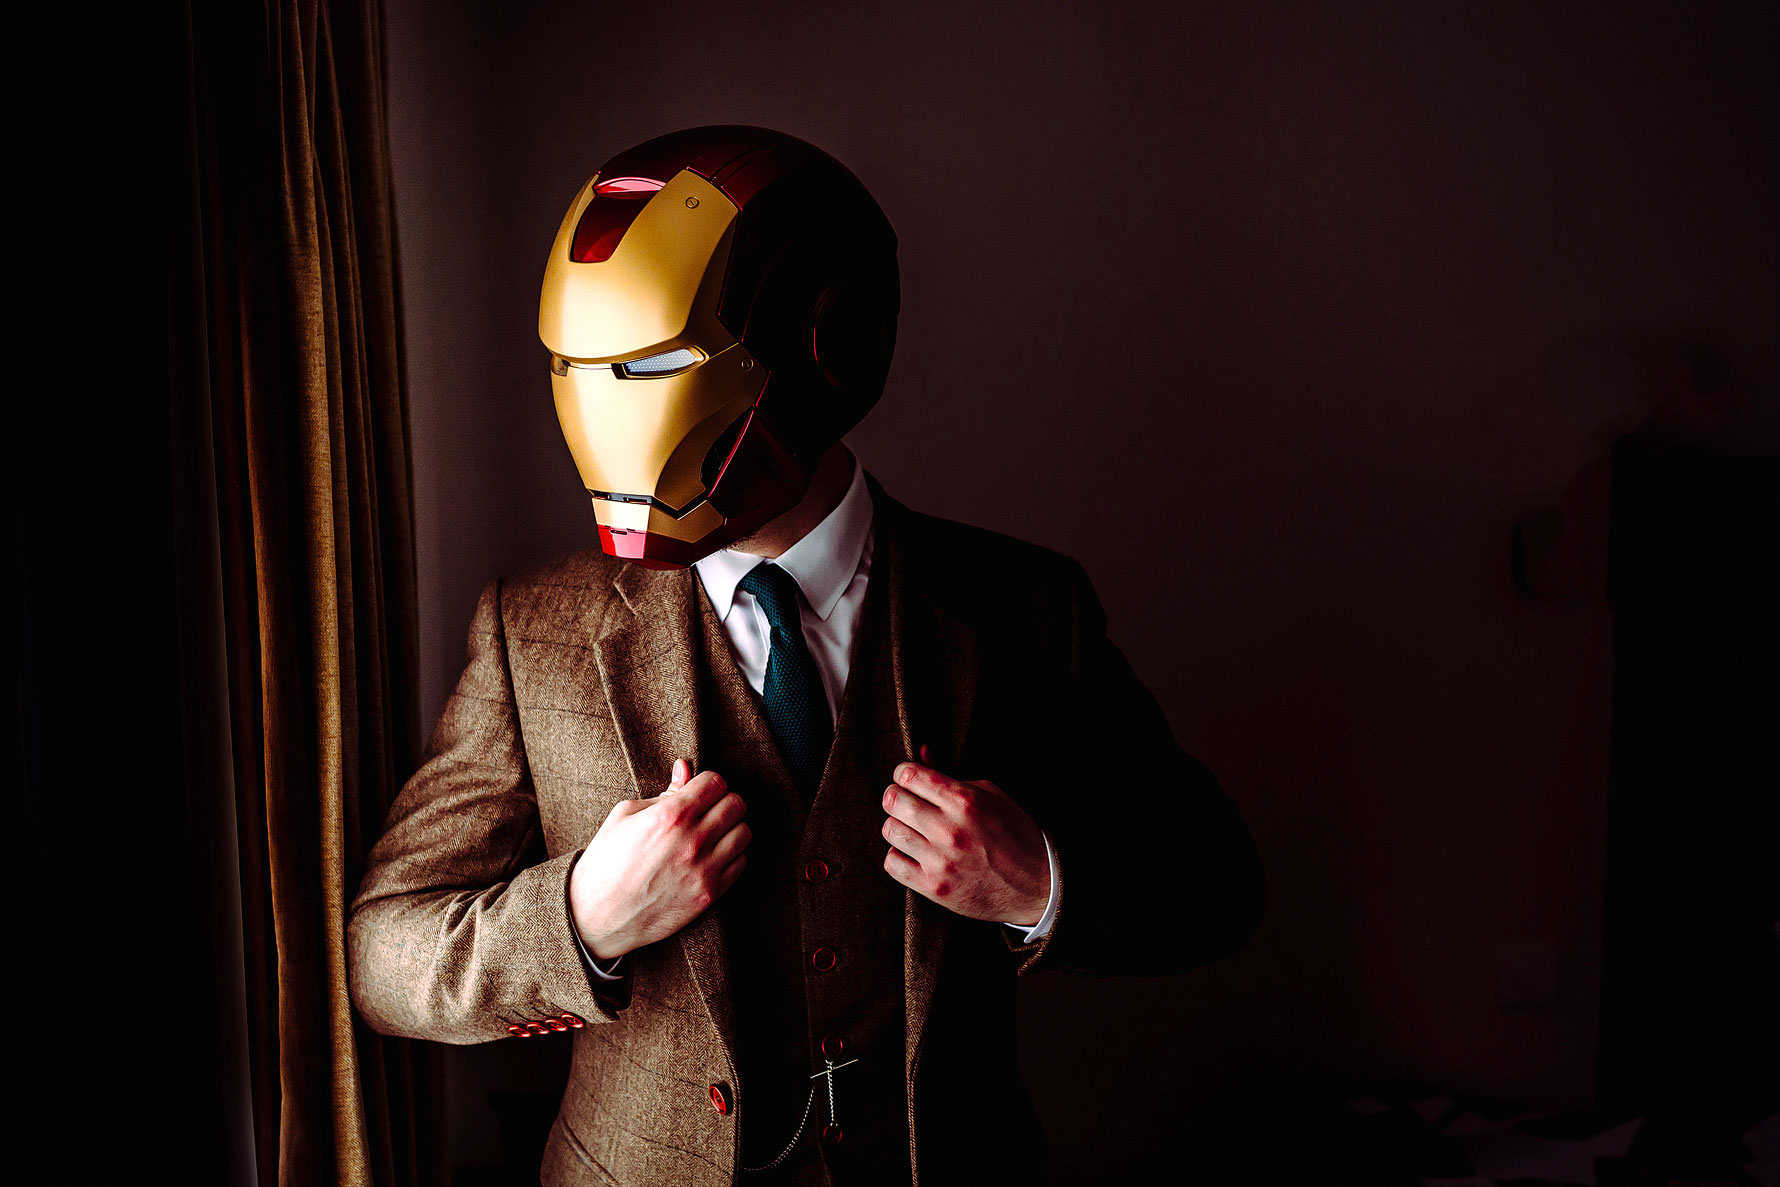 ironman at a wedding